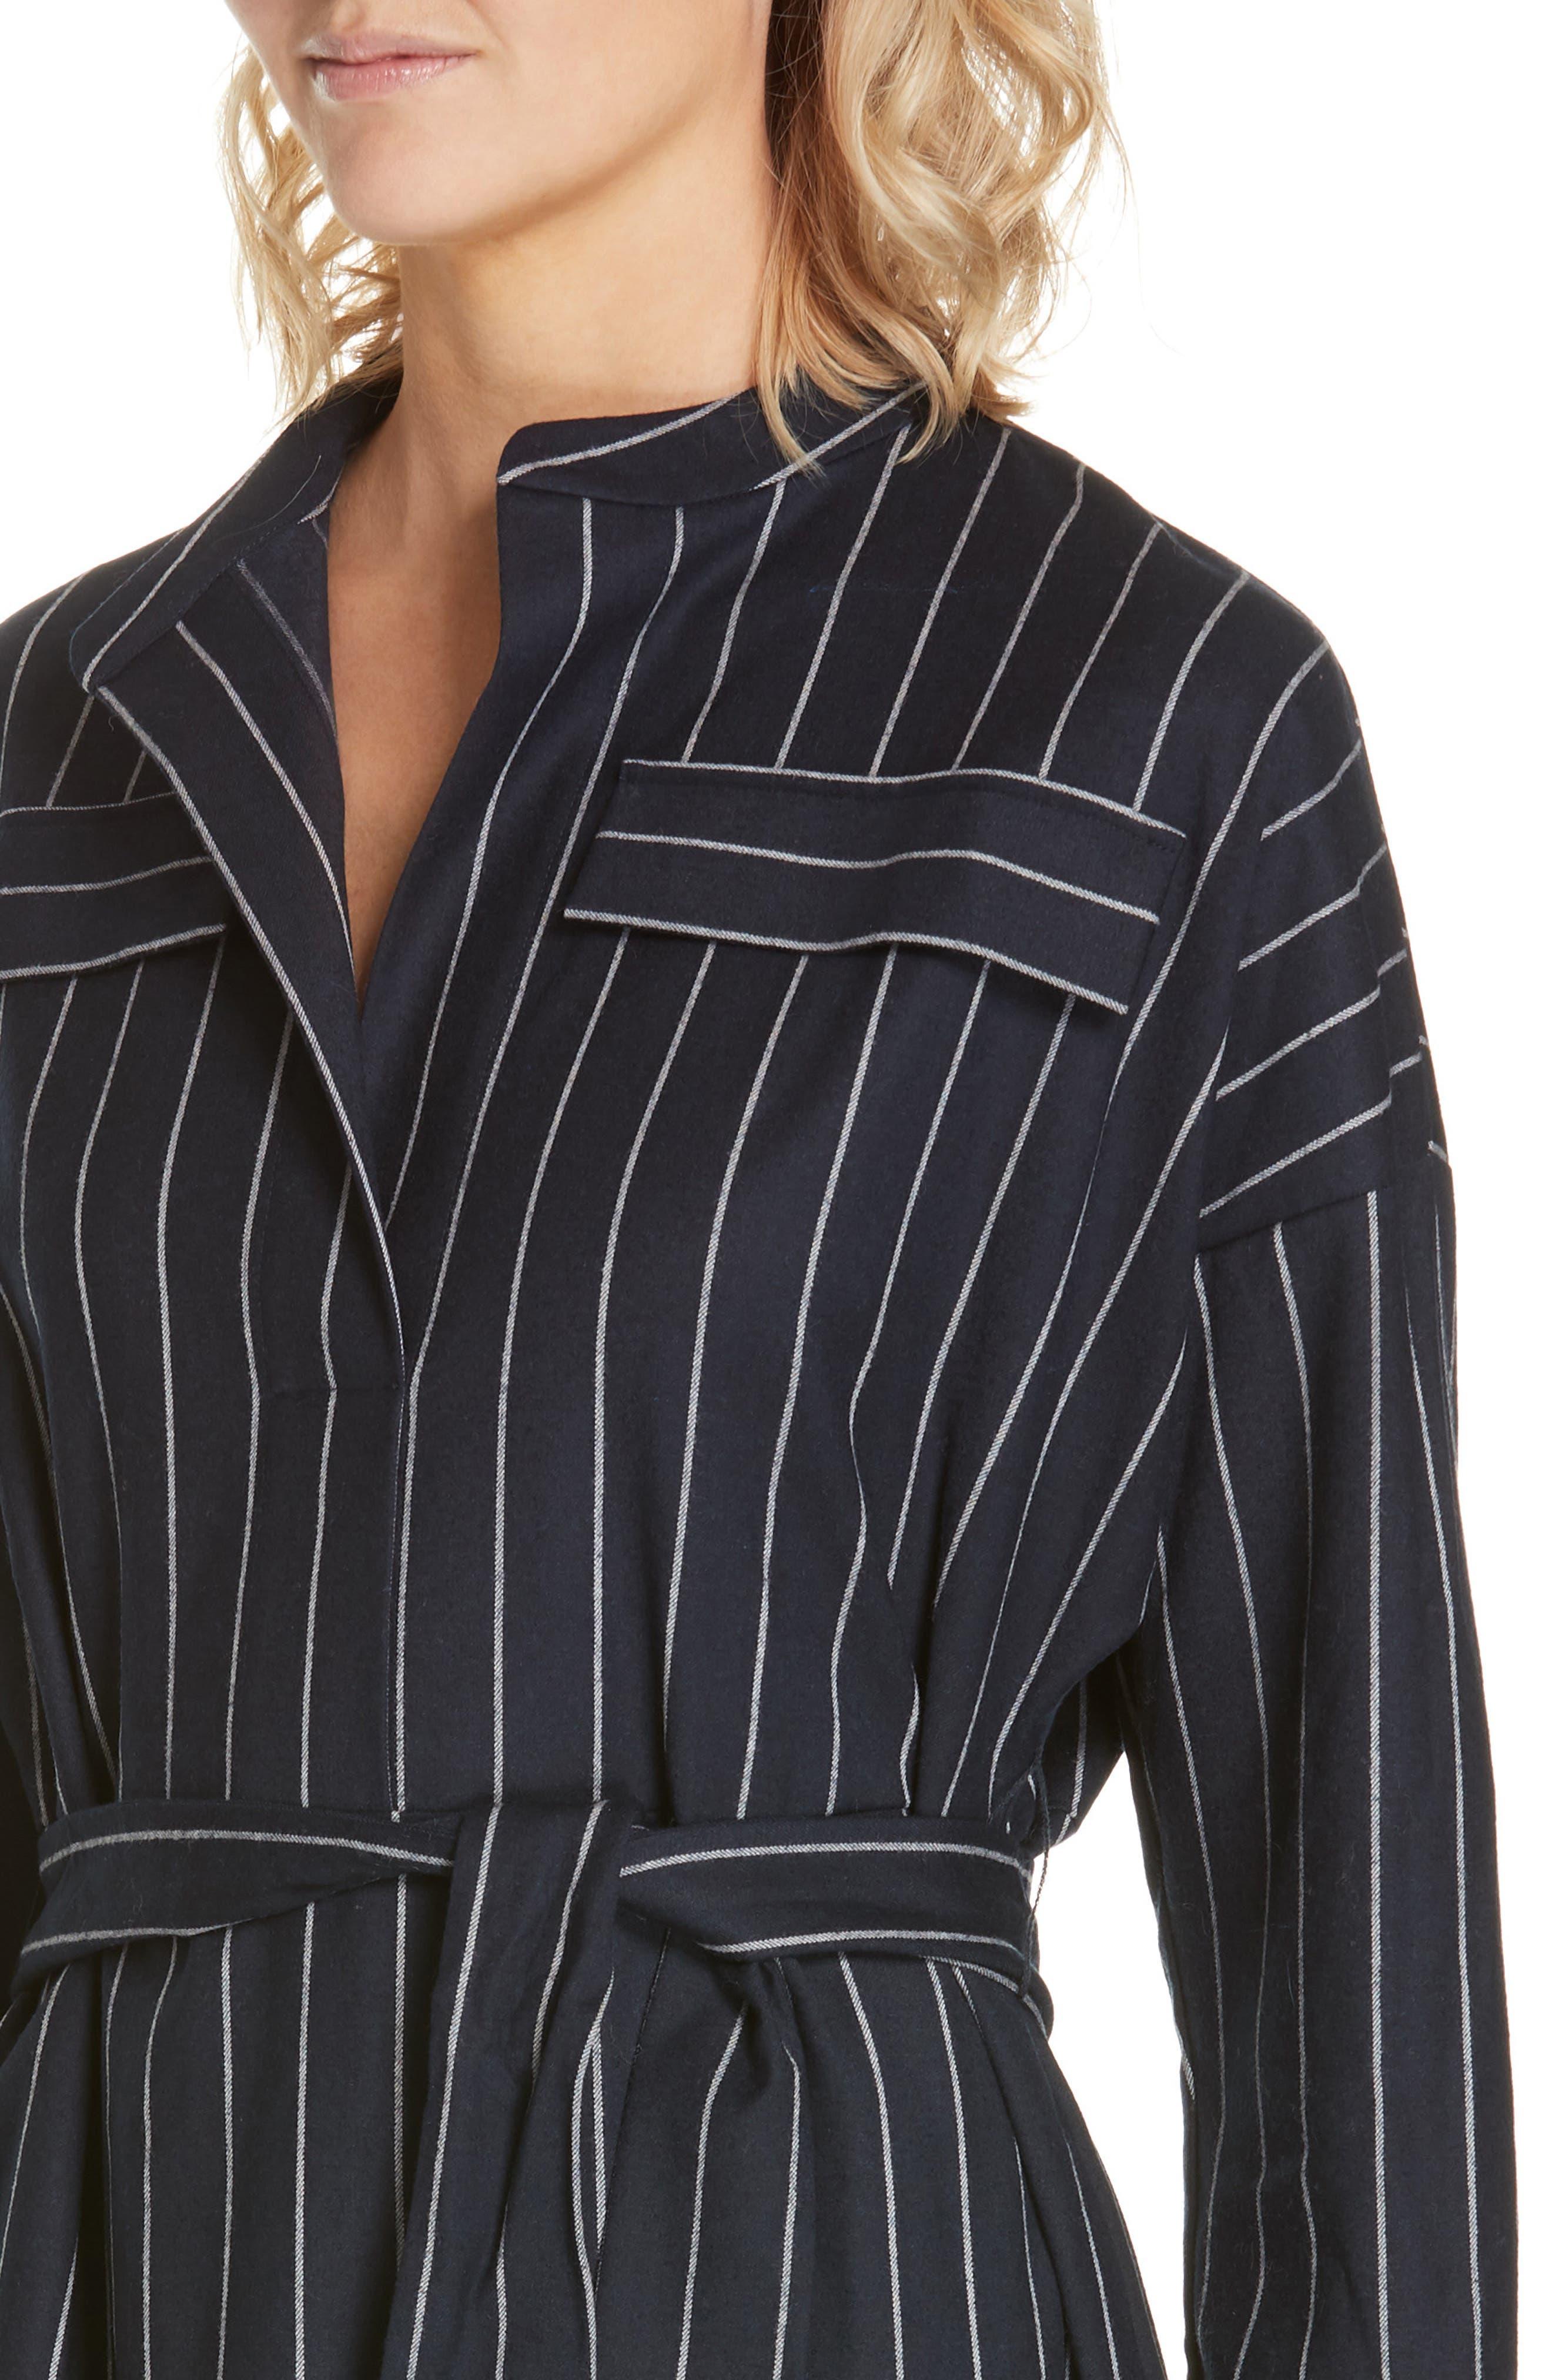 NORDSTROM SIGNATURE,                             Belted Shirtdress,                             Alternate thumbnail 4, color,                             NAVY- WHITE PREPPY STRIPE